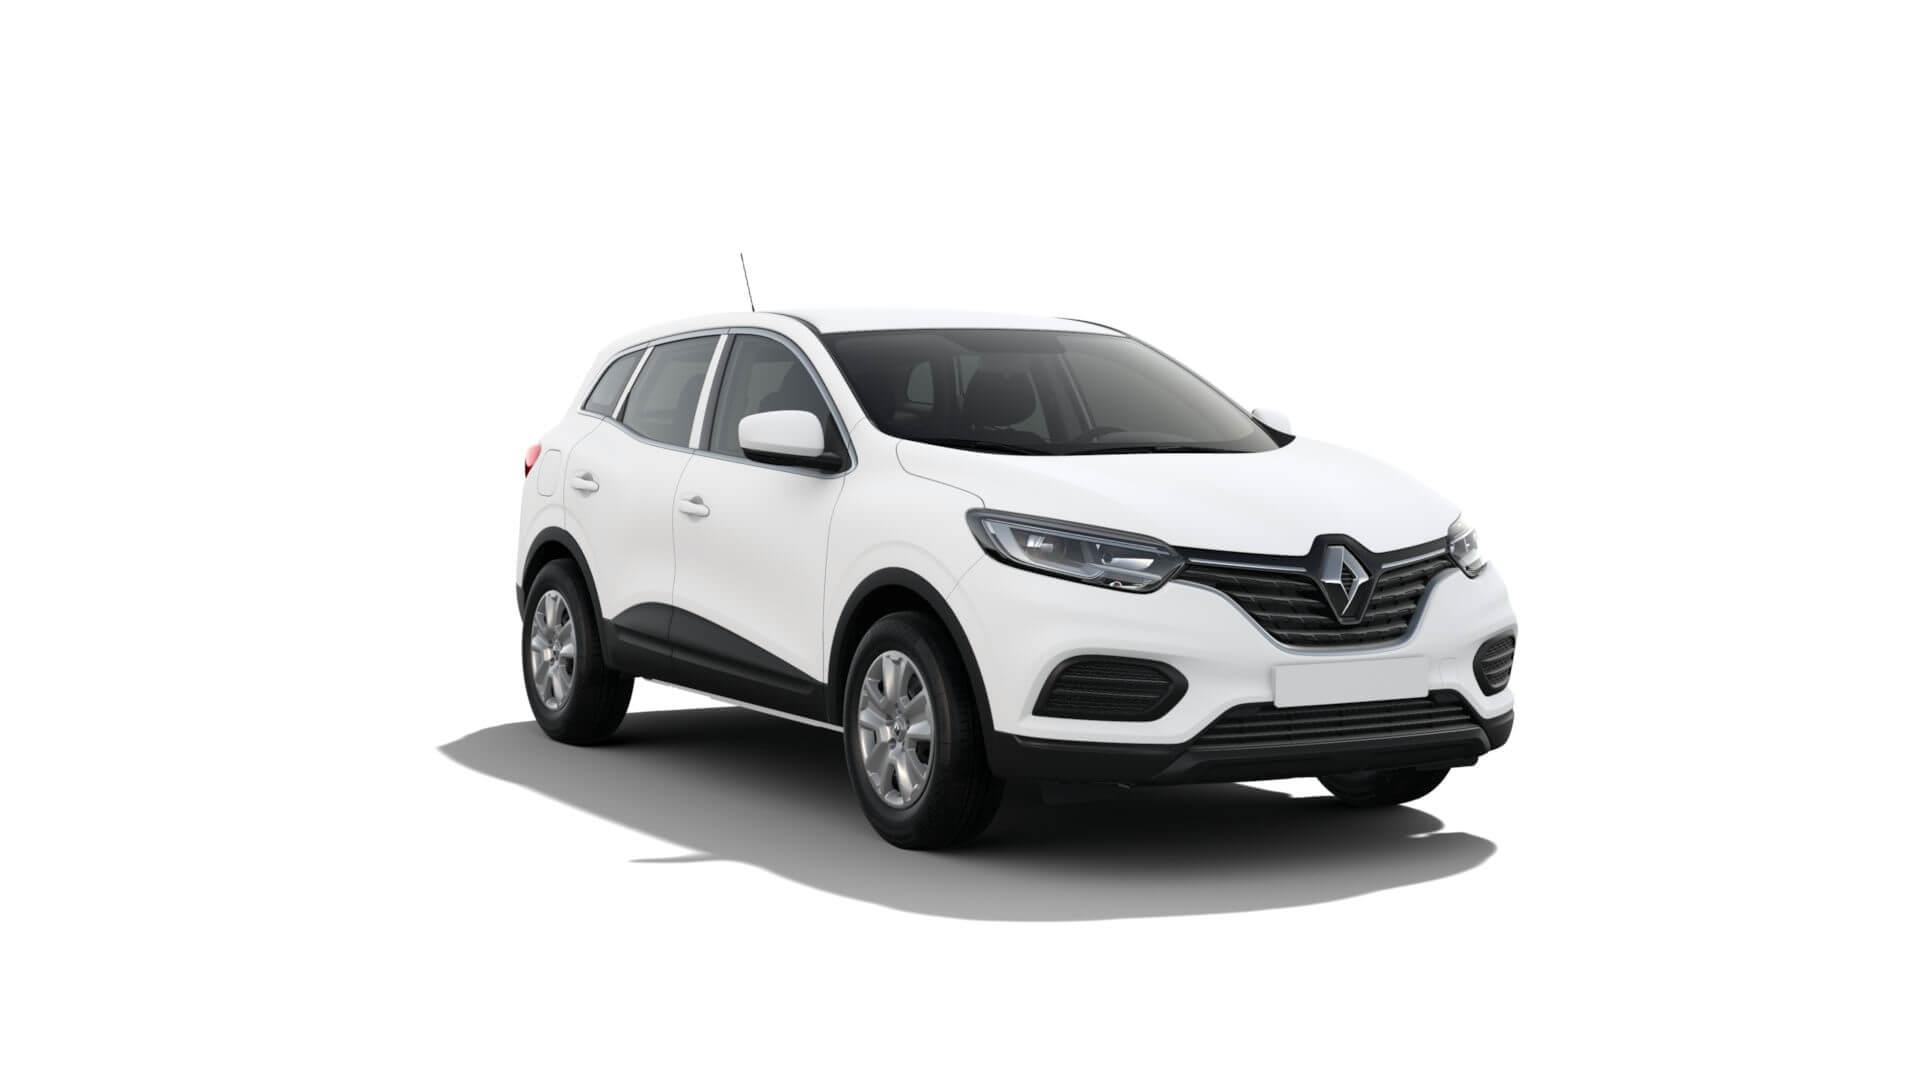 Automodell weiß - Renault Kadjar - Renault Ahrens Hannover